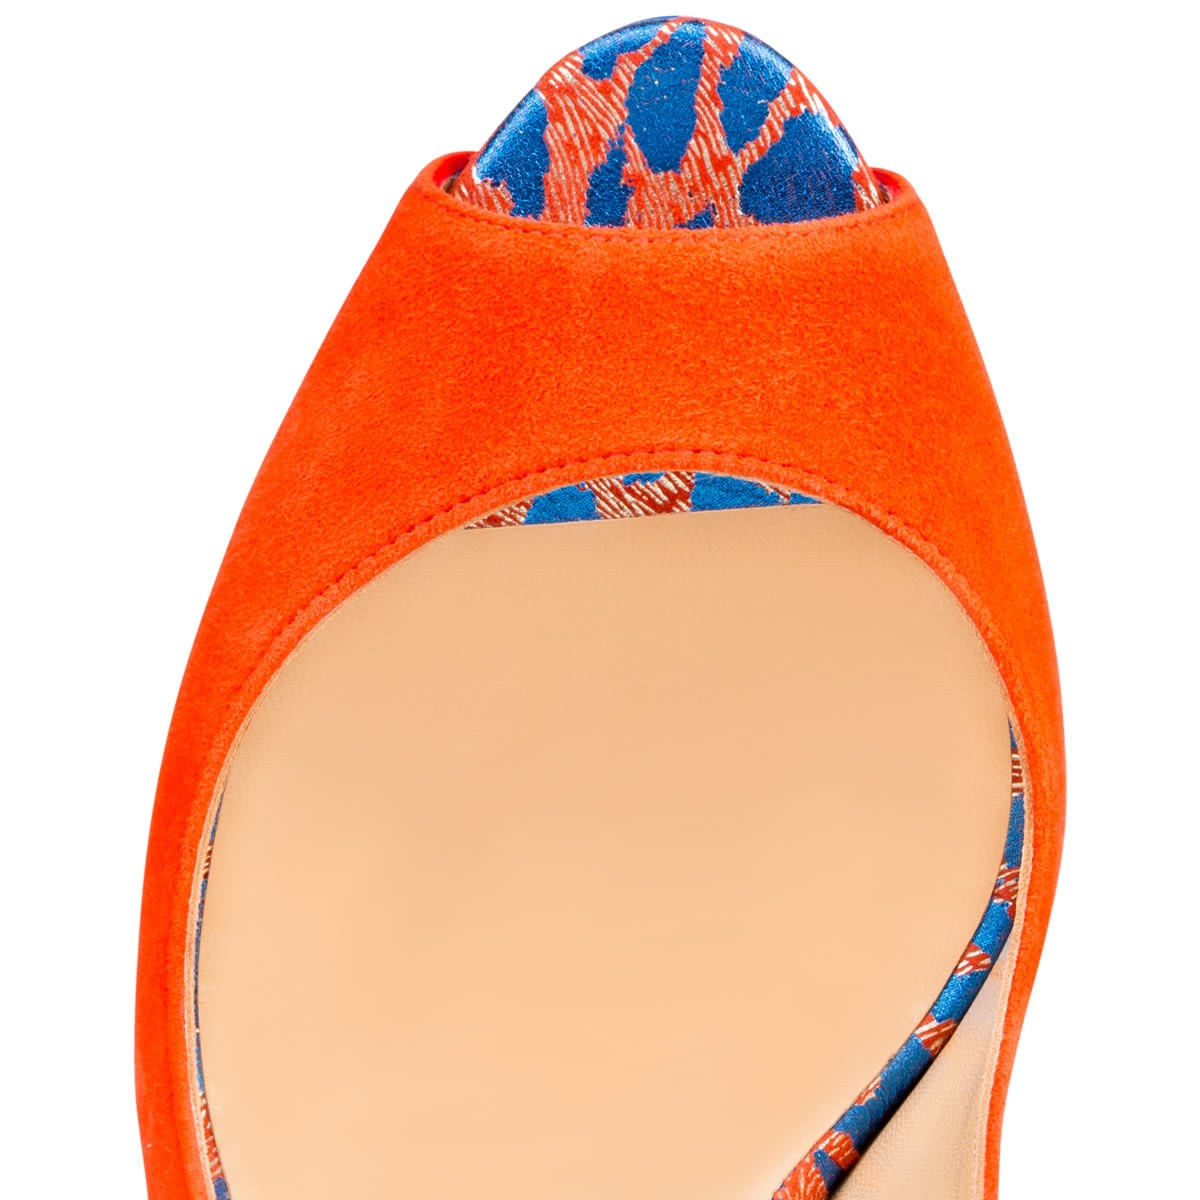 468dd5818d4 Artesur » christian louboutin lady peep sling Orange Blue Suede